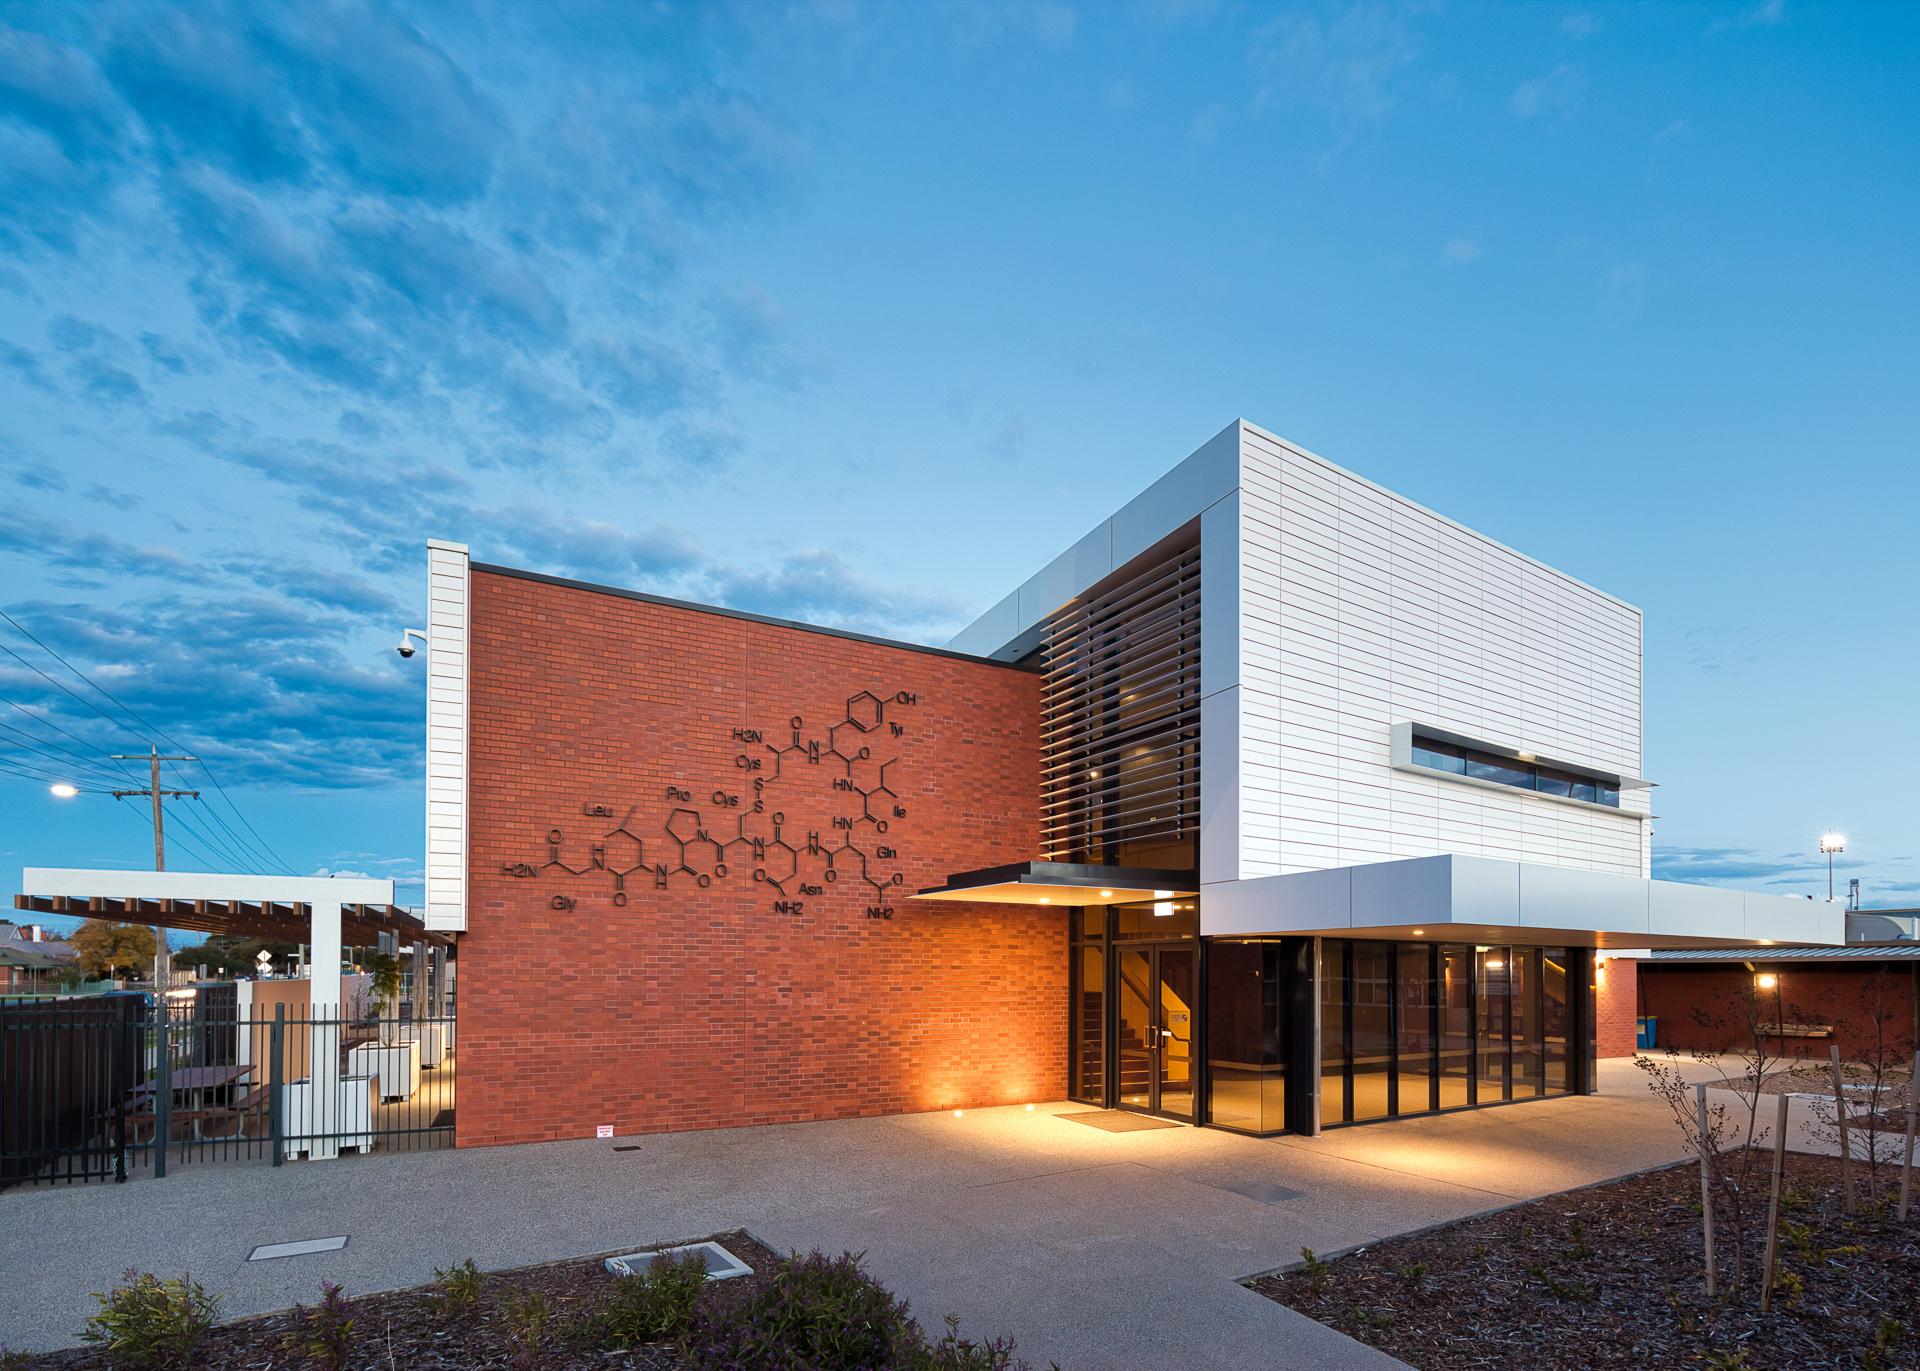 notre-dame-college-science-centre-shepparton-vic---terracade-tn-glazed---whitehaven-12_29568915527_o.jpg